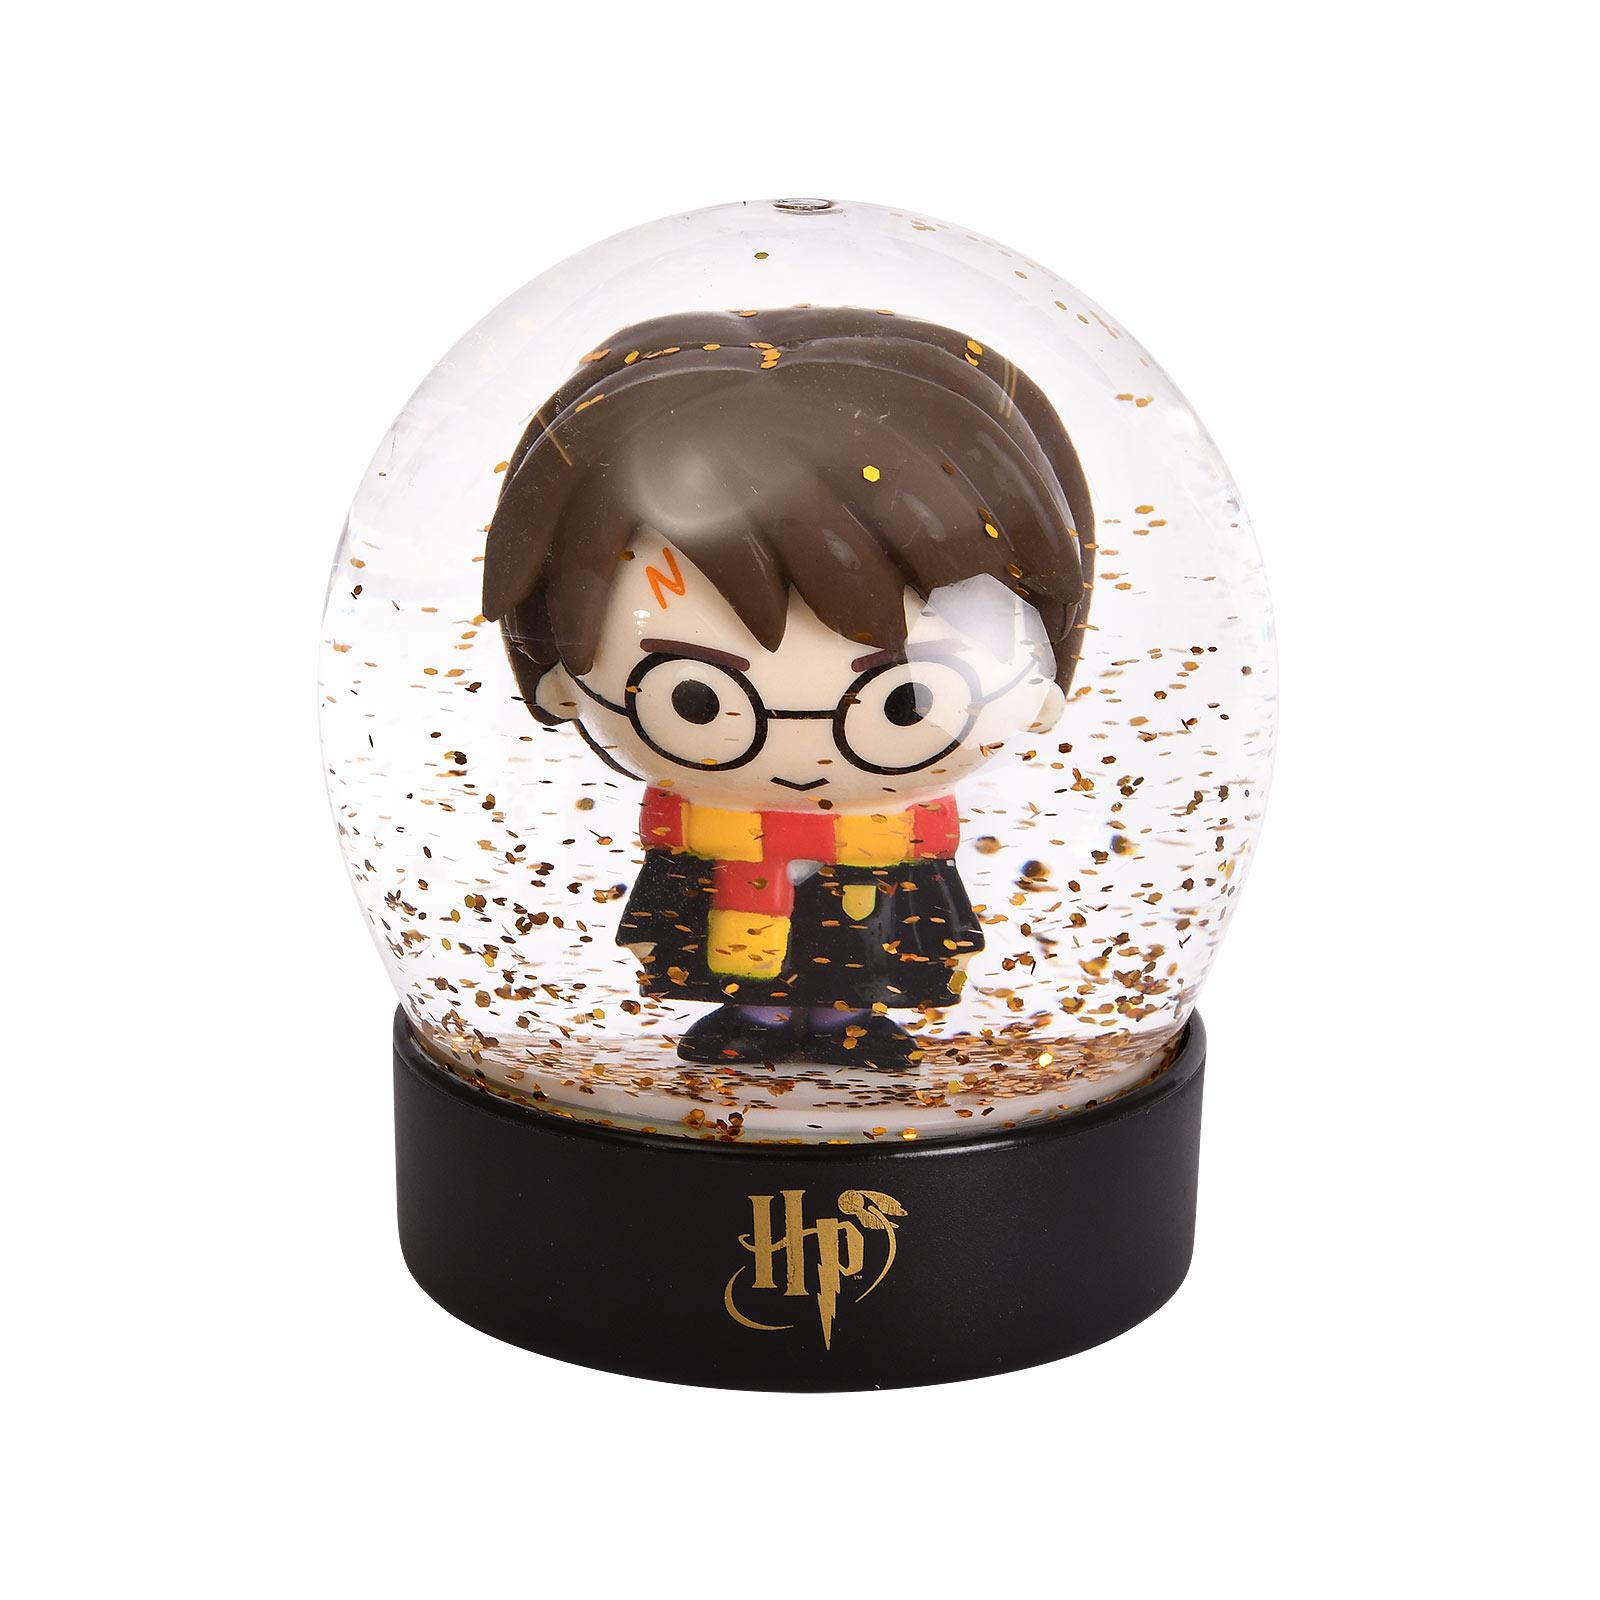 Harry Potter Chibi Schneekugel mit Glitter